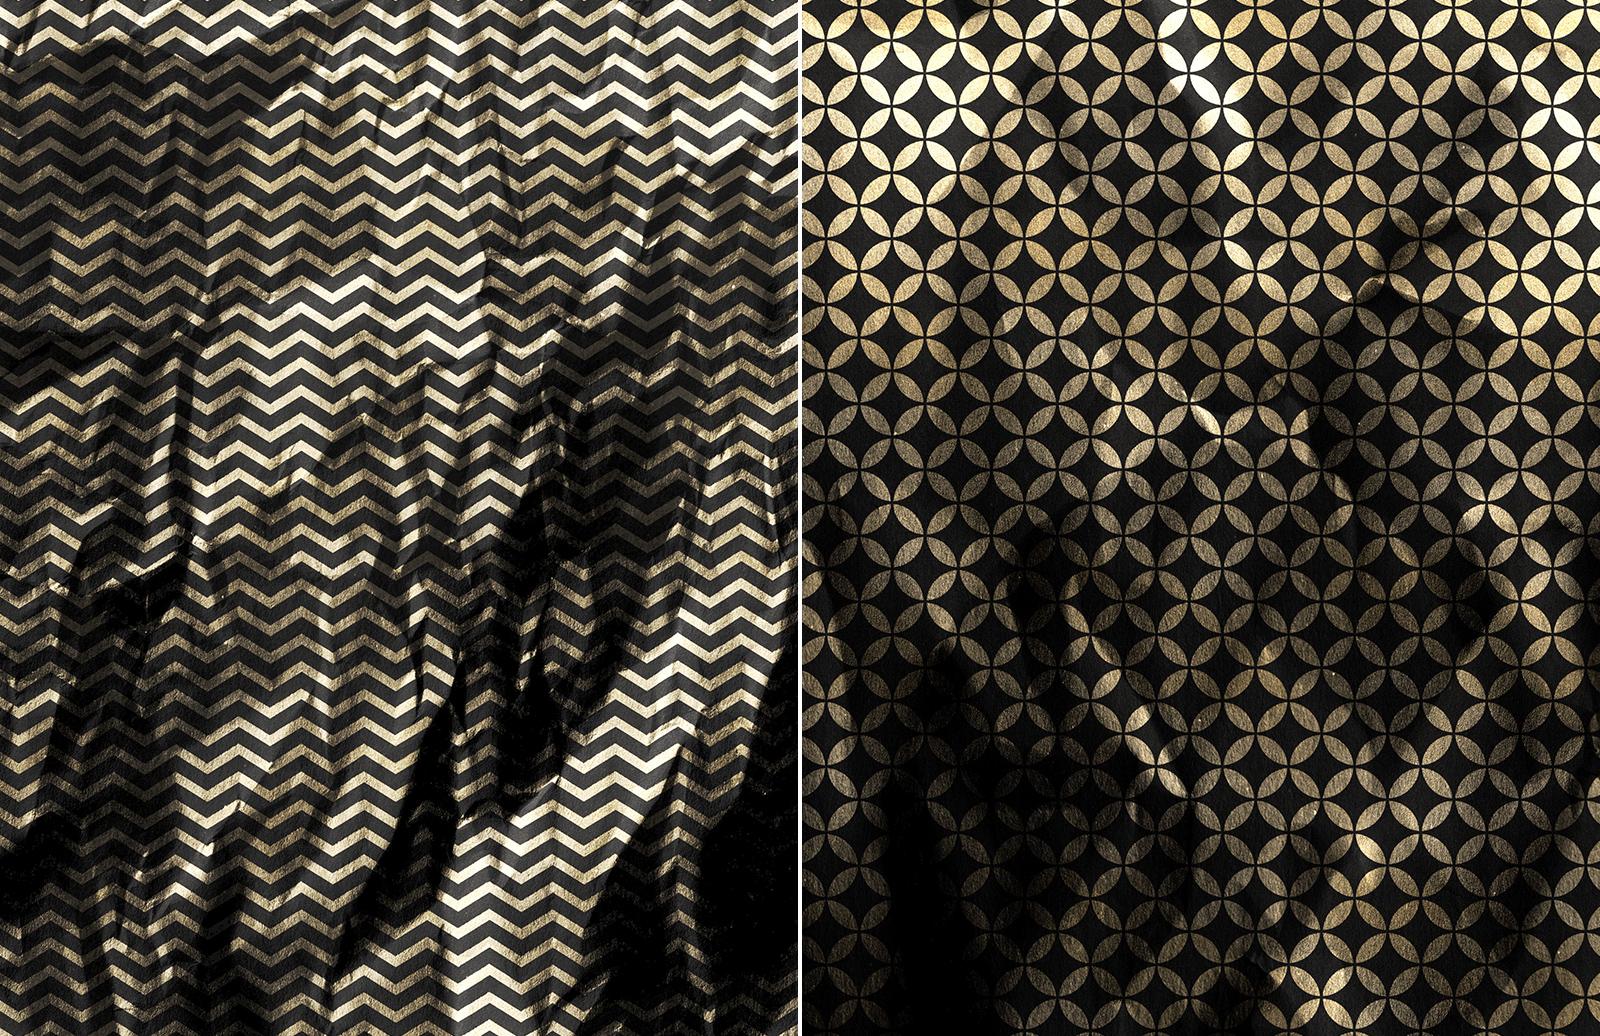 Gold  Foil  Paper  Textures  Preview 3